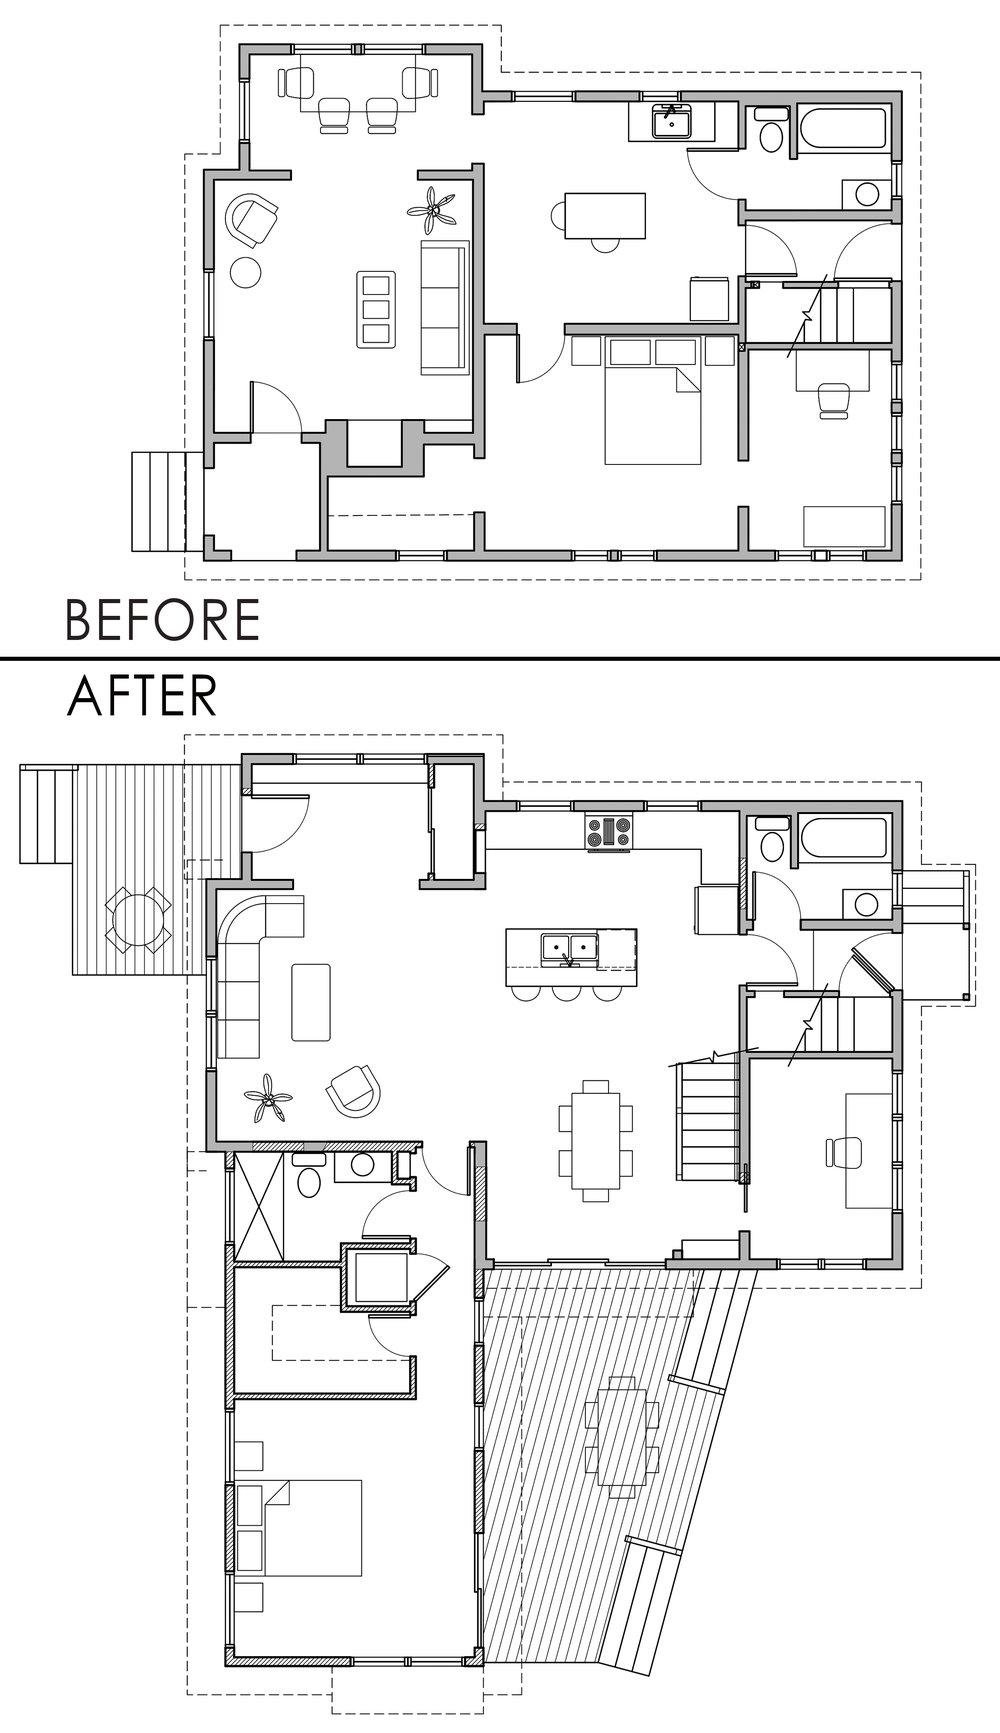 Harka Architecture - Arbor Lodge - Custom Home Remodel (16).jpg